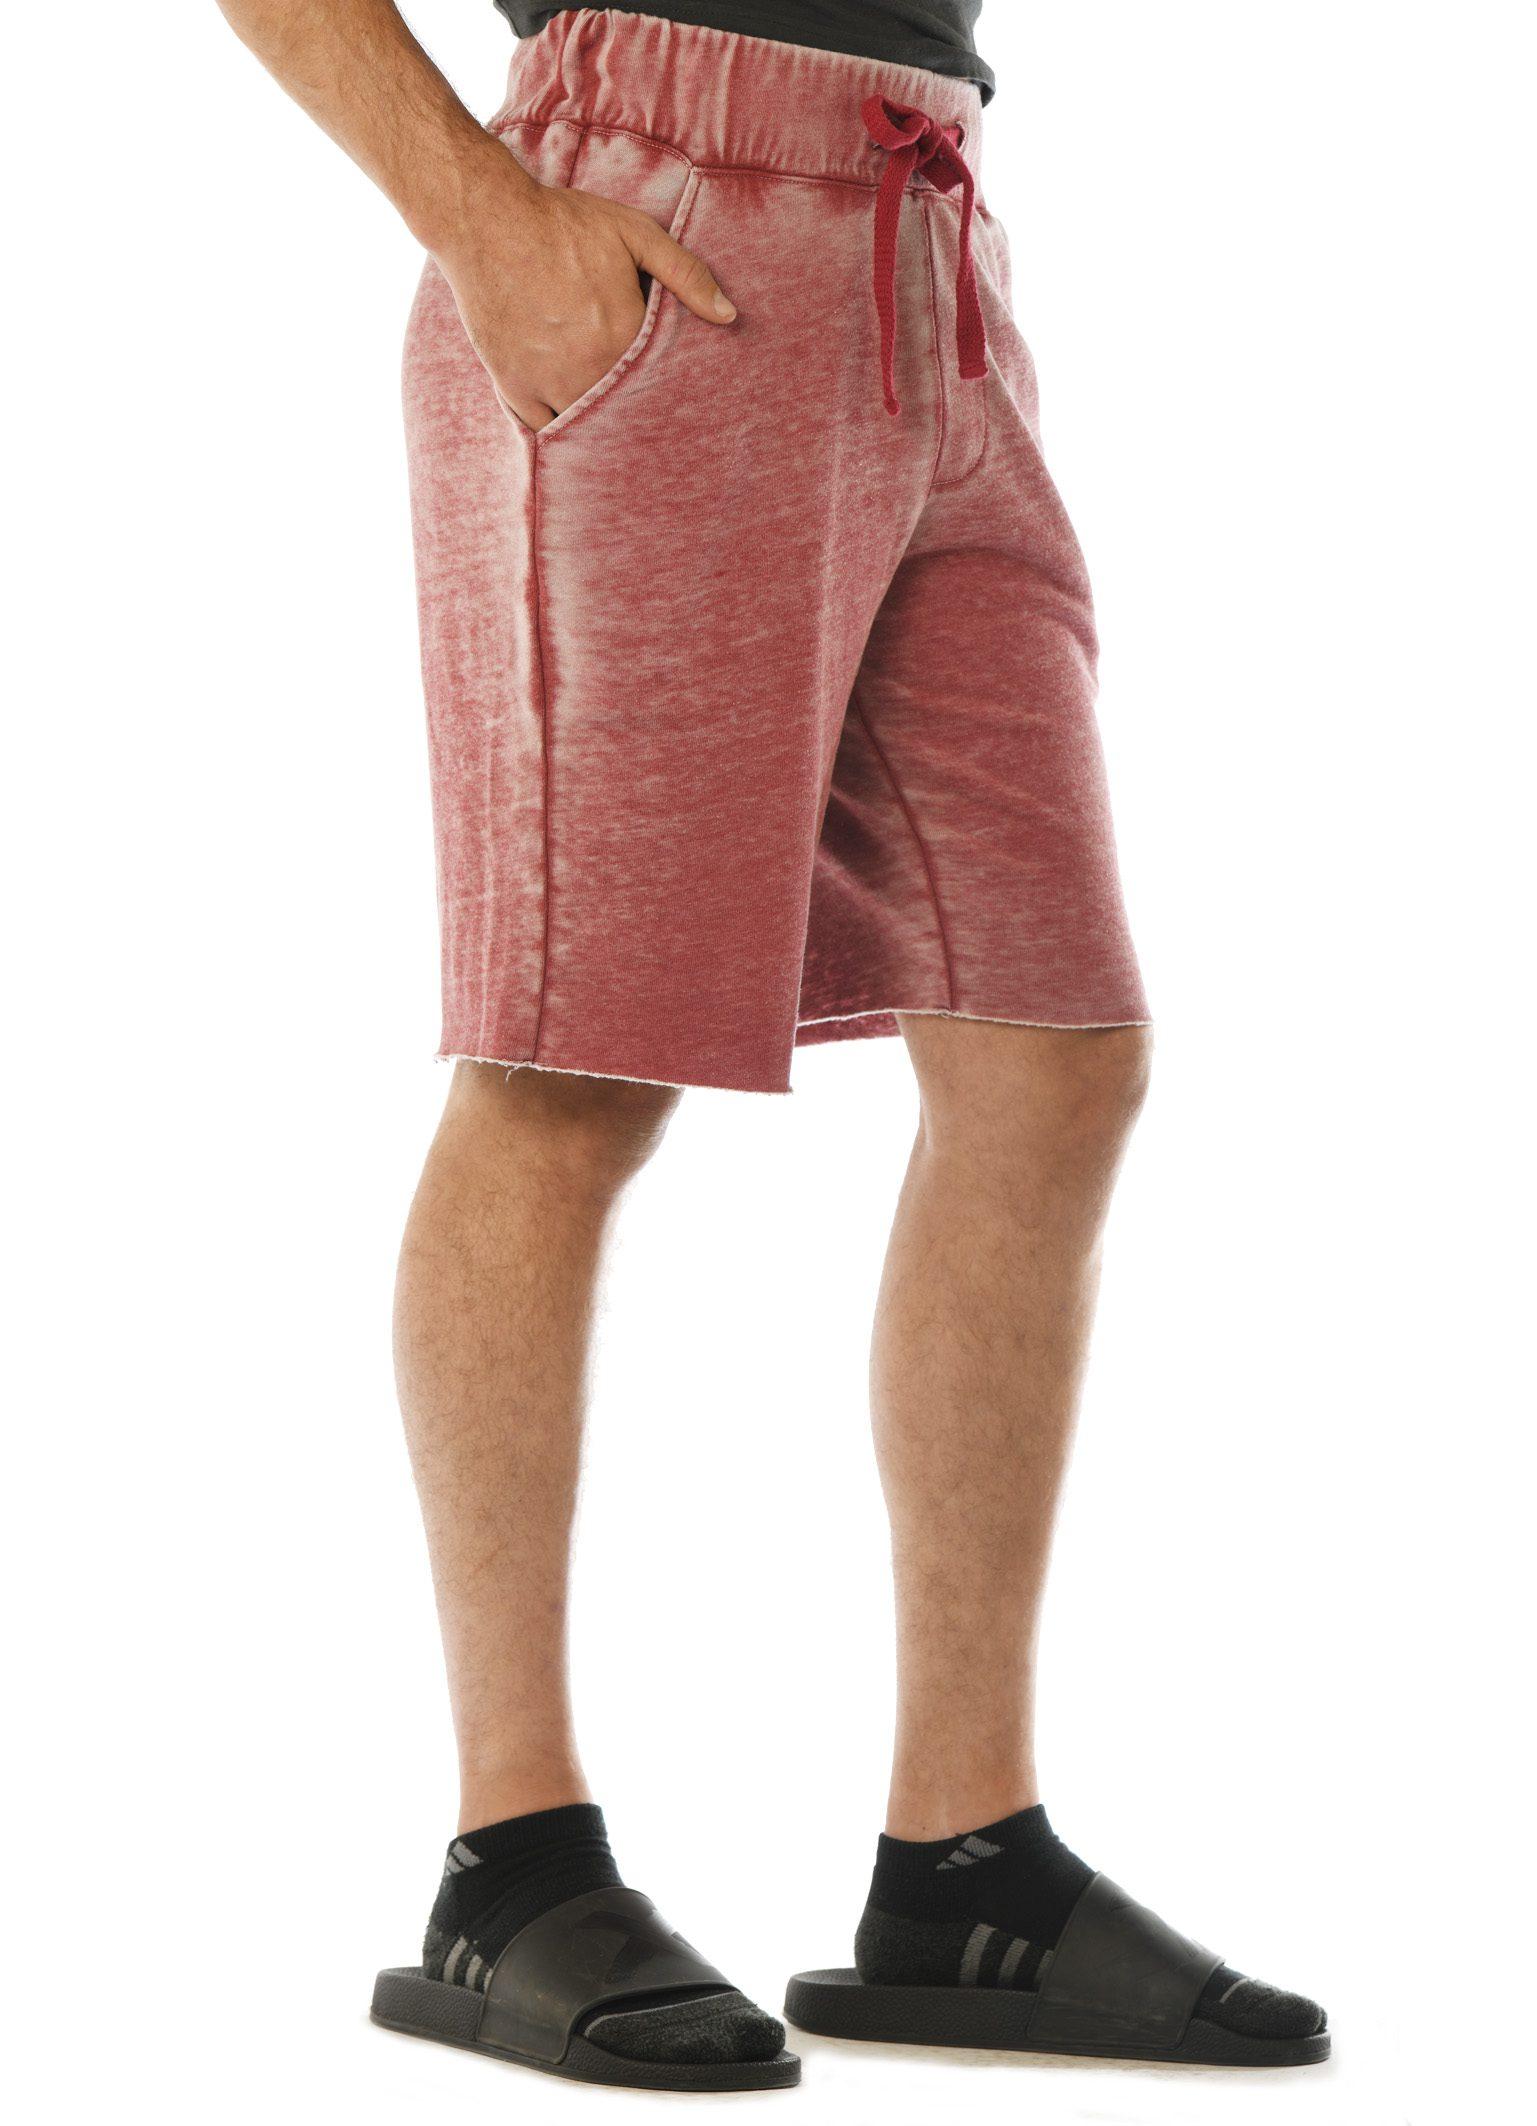 GG 315-FT-B Men's WornWash Shorts-Side